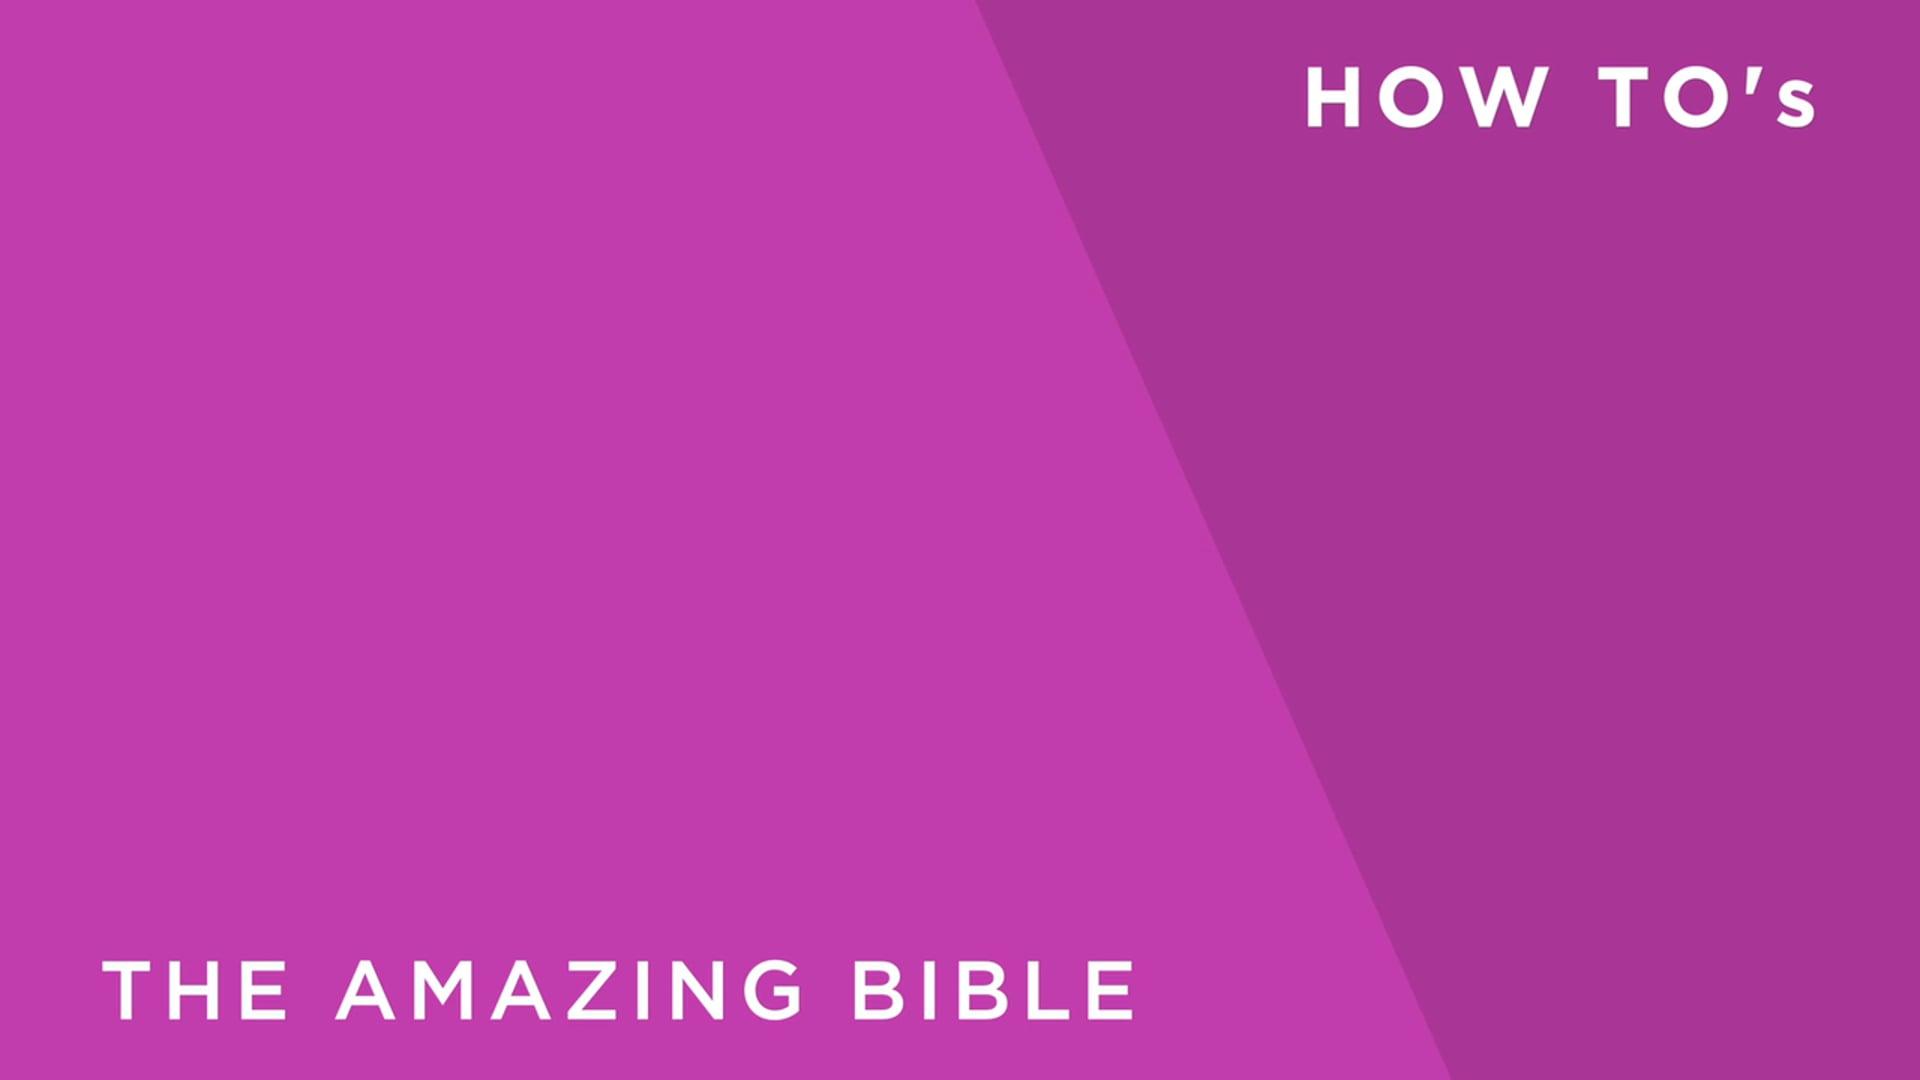 The Amazing Bible